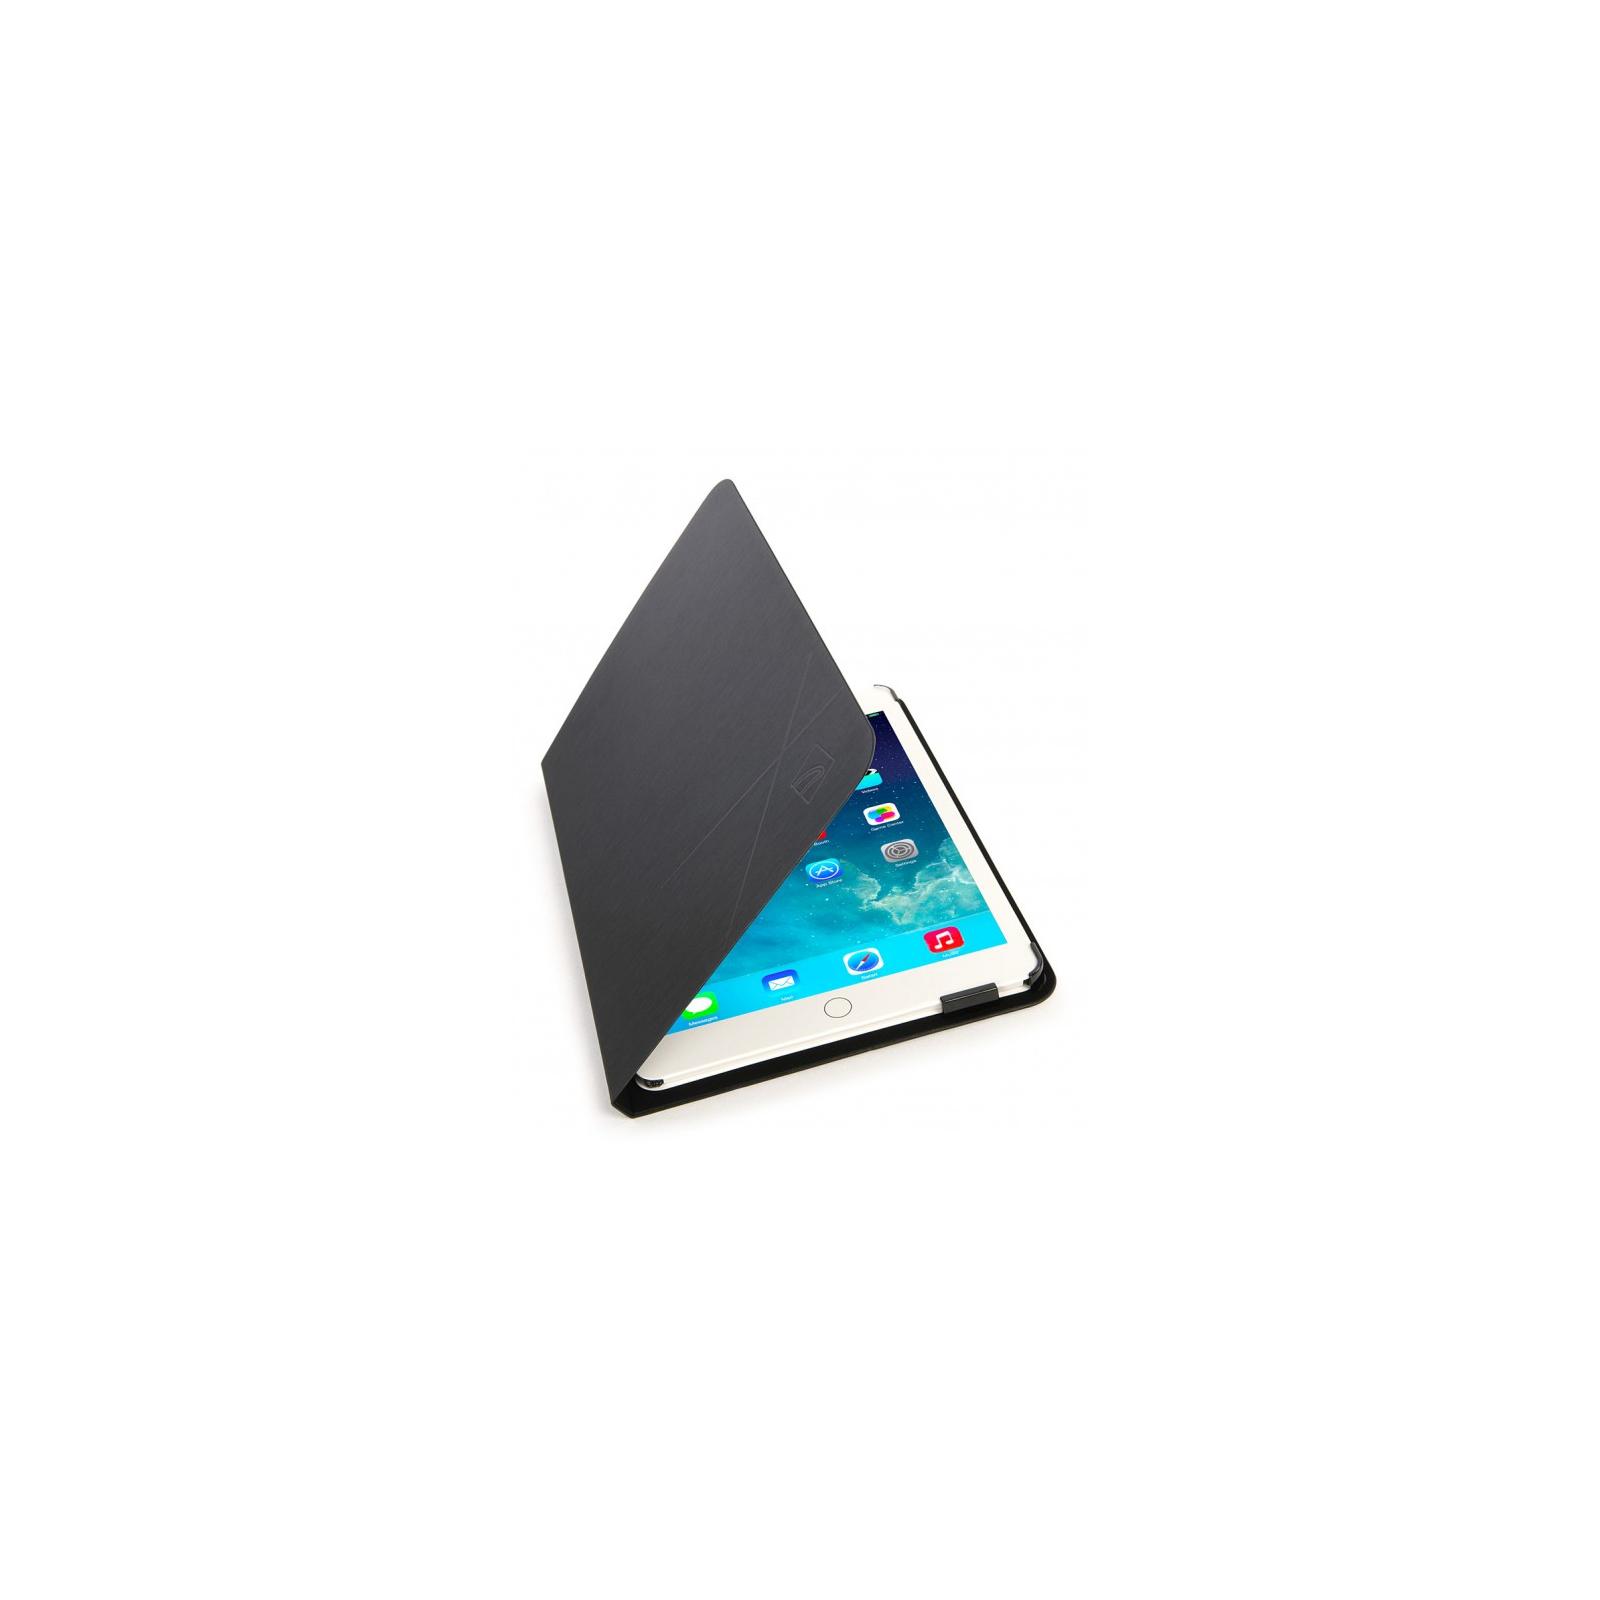 Чехол для планшета Tucano iPad Air Filo Black (IPD5FI) изображение 8